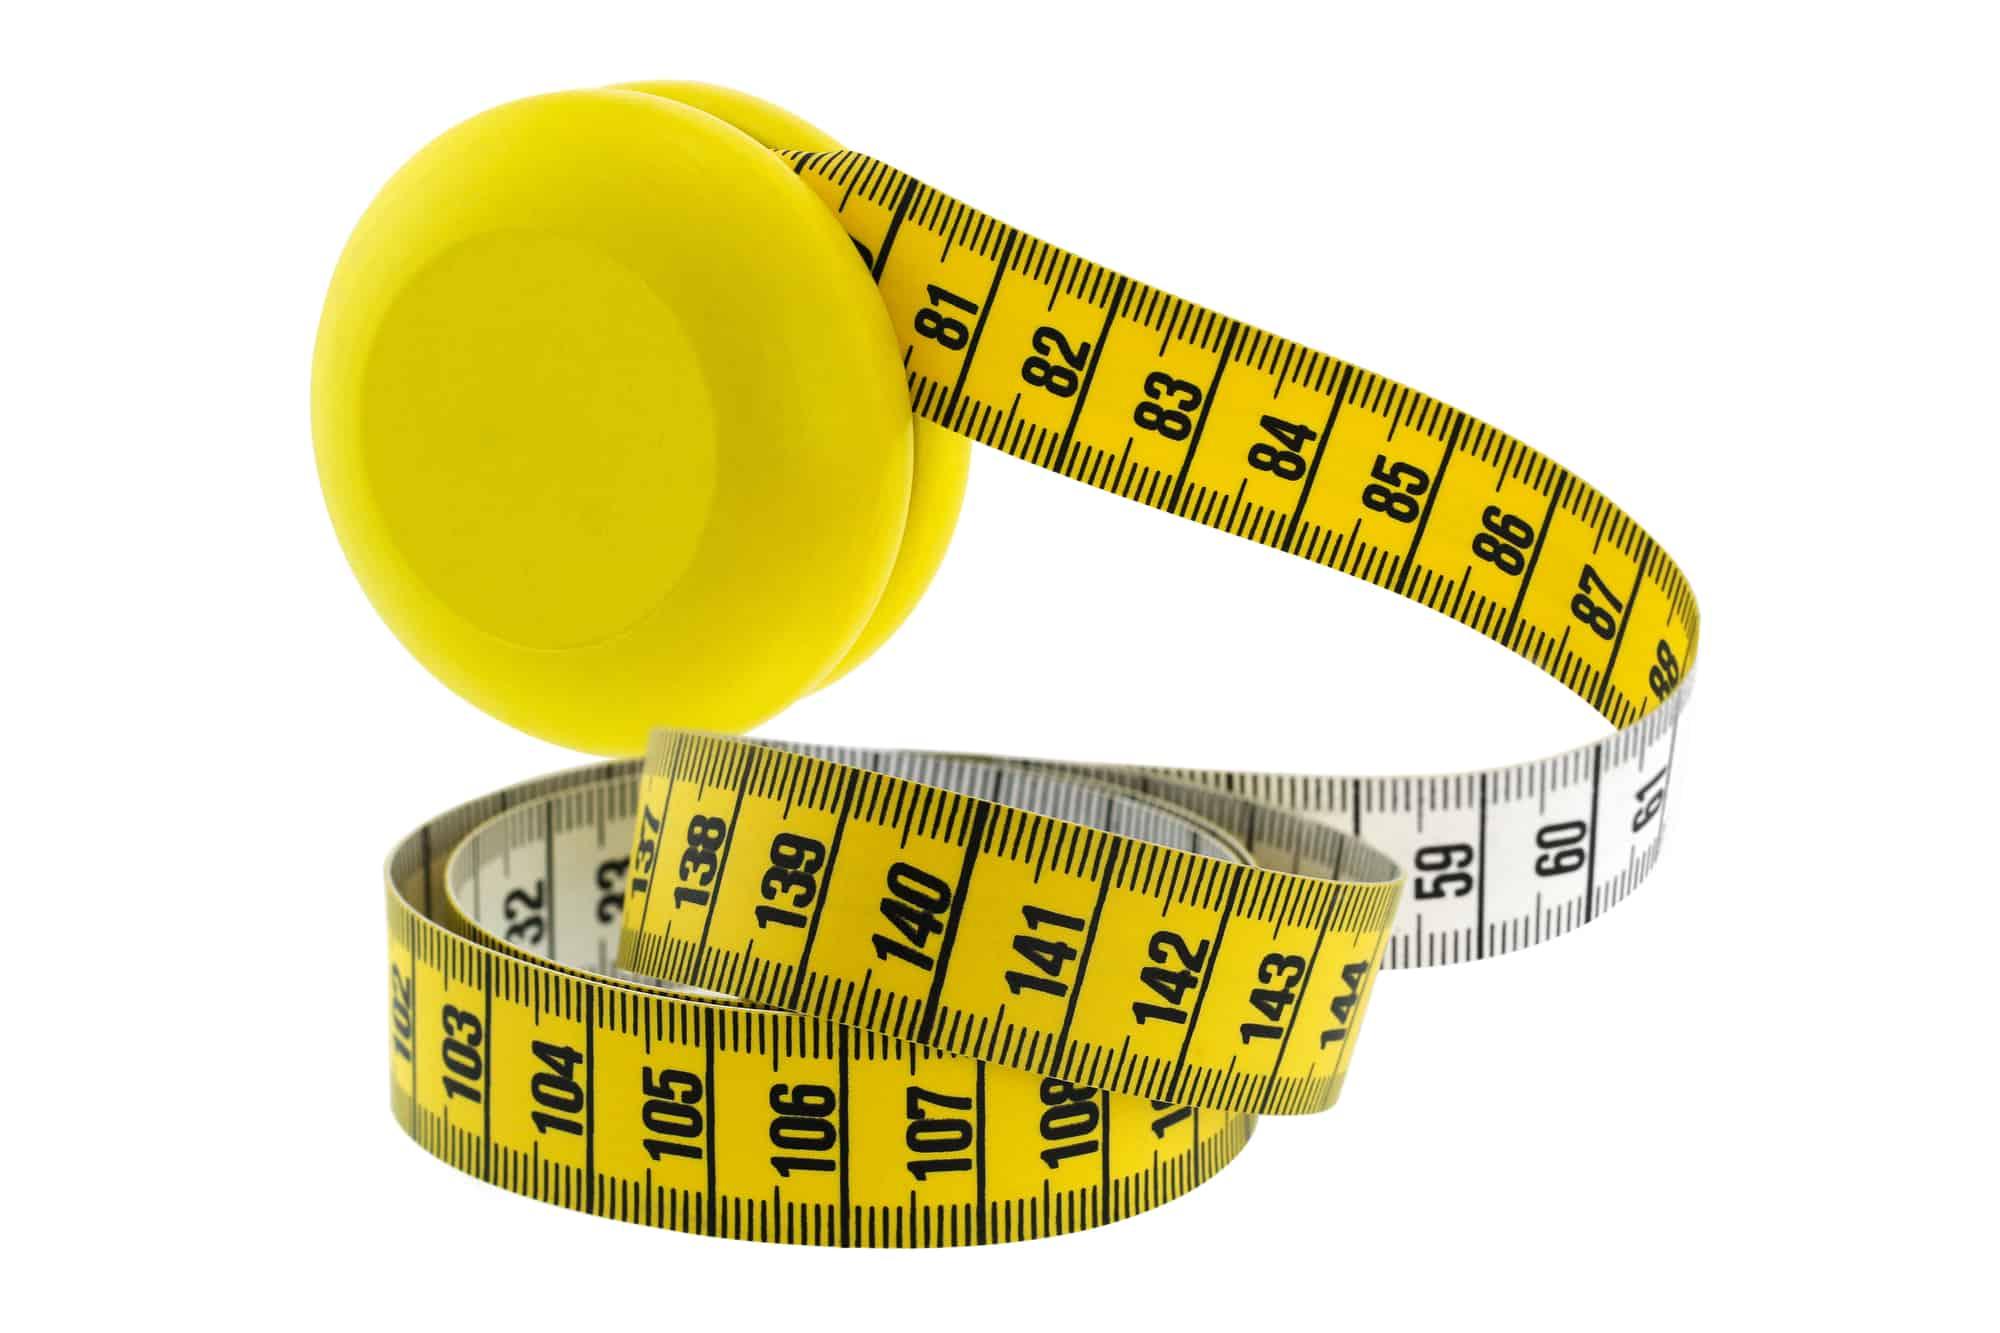 8 Reasons Why Yo-yo Dieting Isn't Good for You